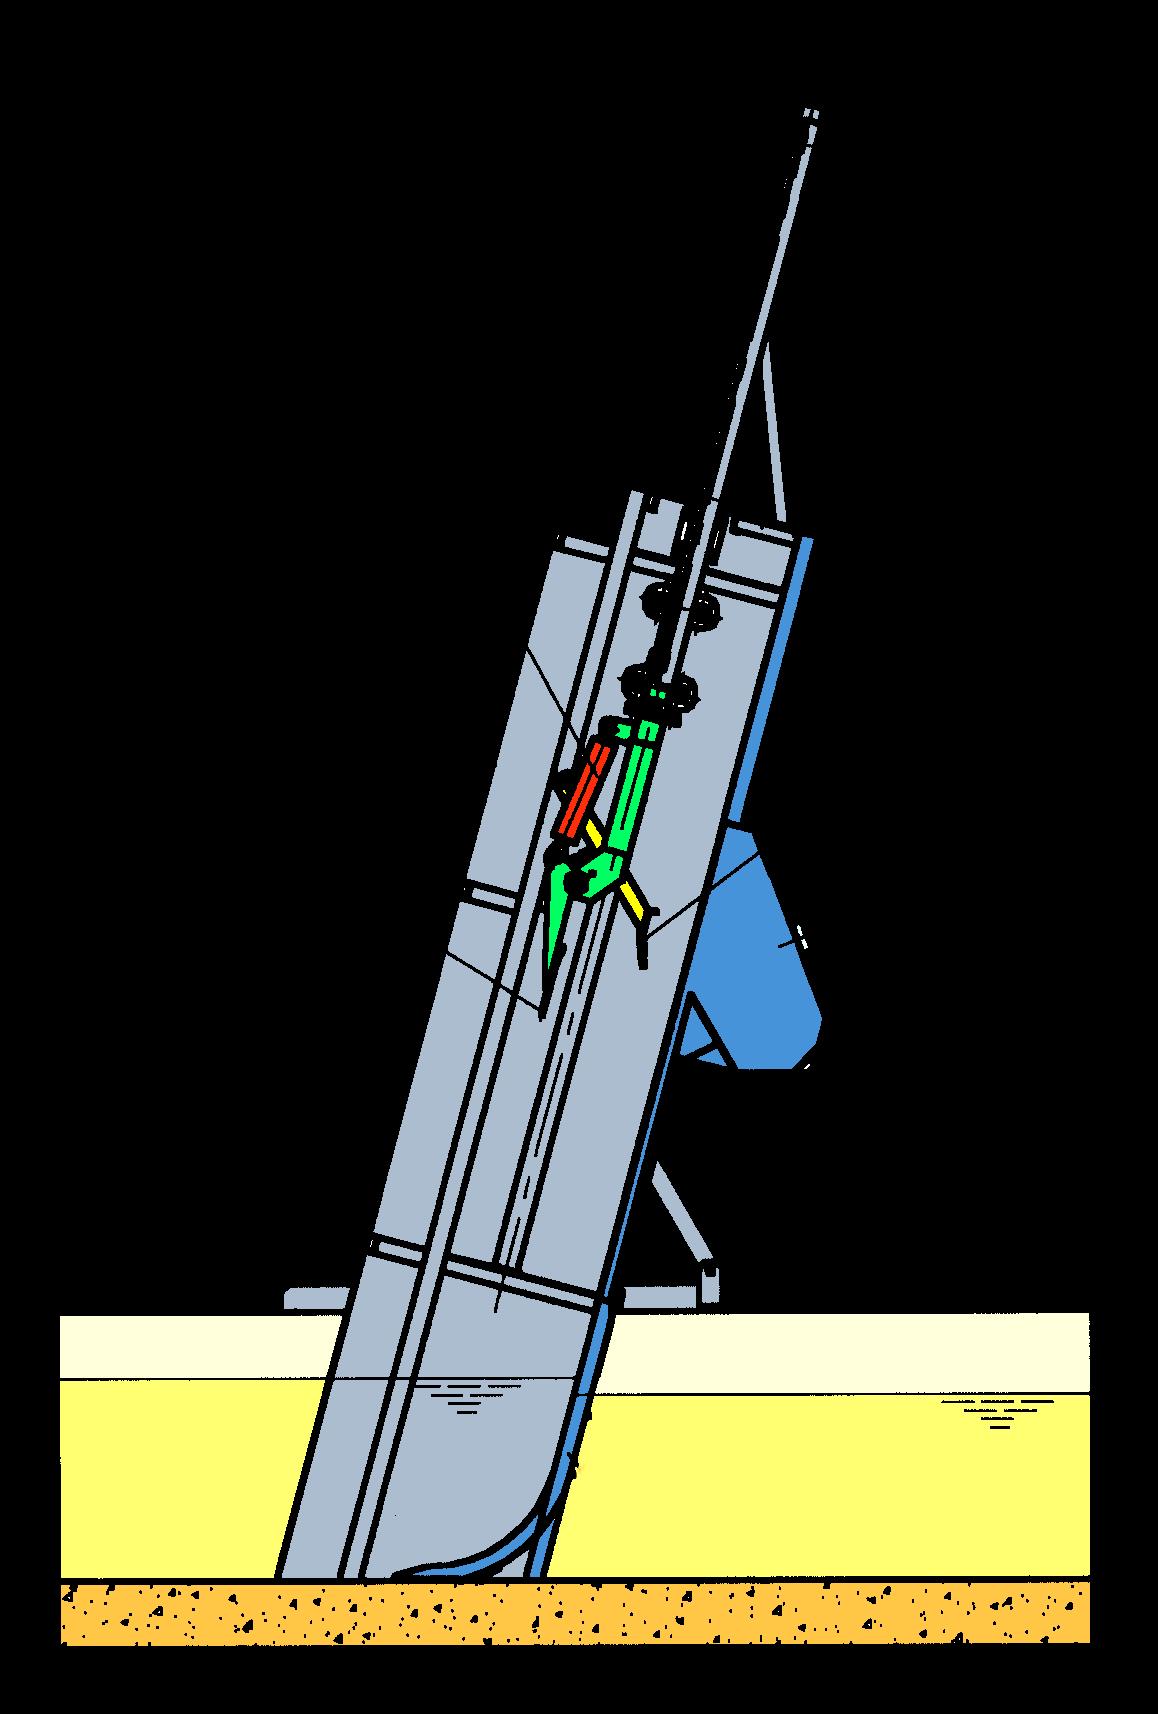 Griglia idraulica a barre a pulizia frontale-mobile